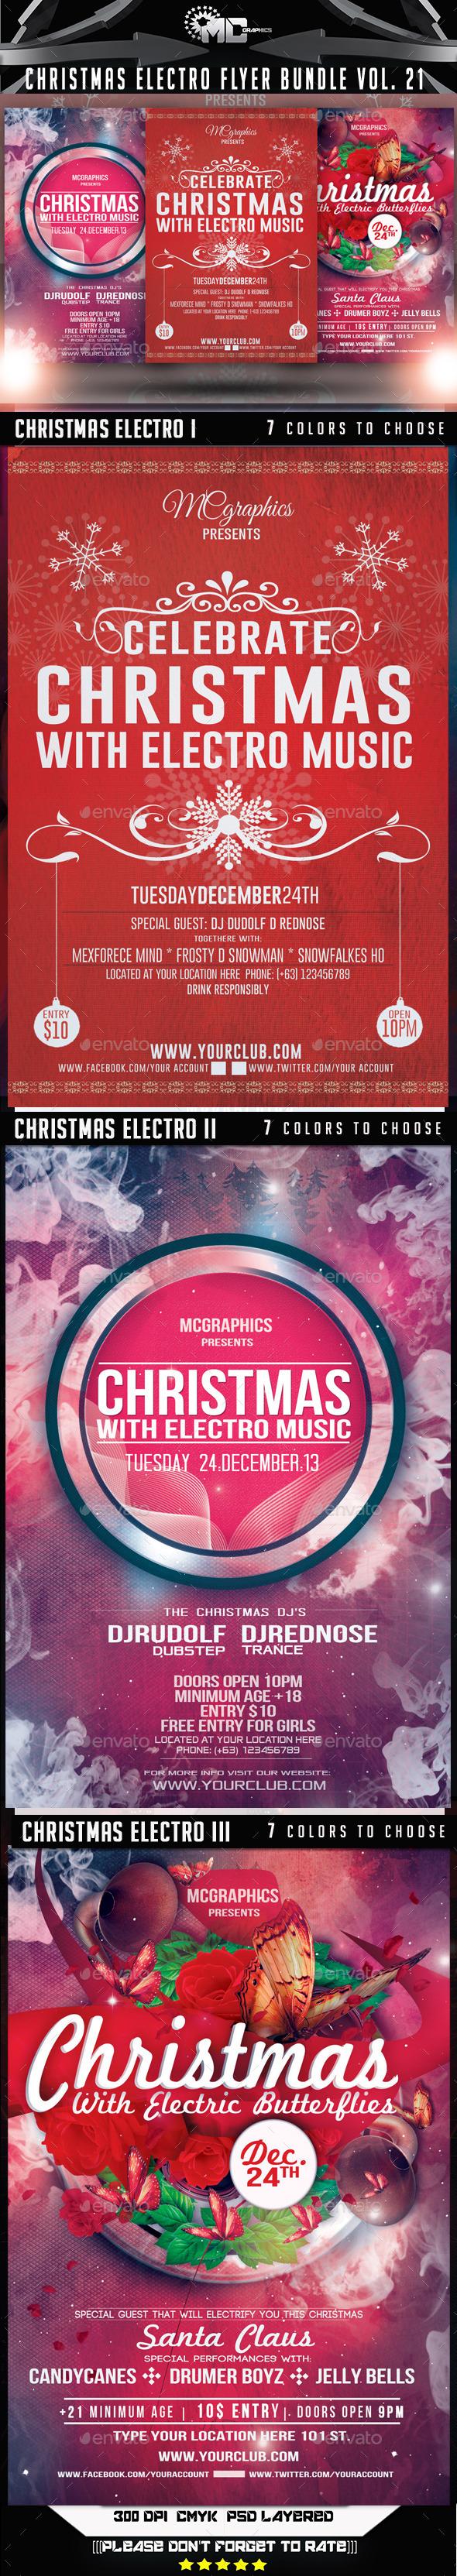 Christmas Electro Flyer Bundle Vol. 1 - Events Flyers